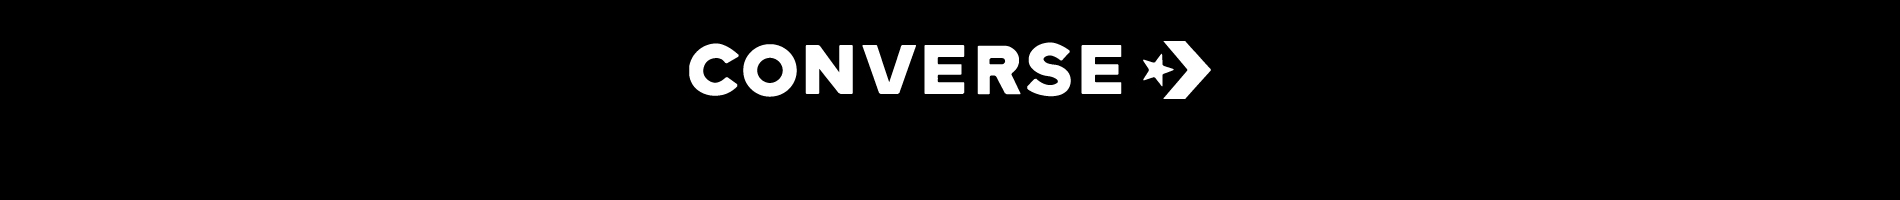 banner-converse